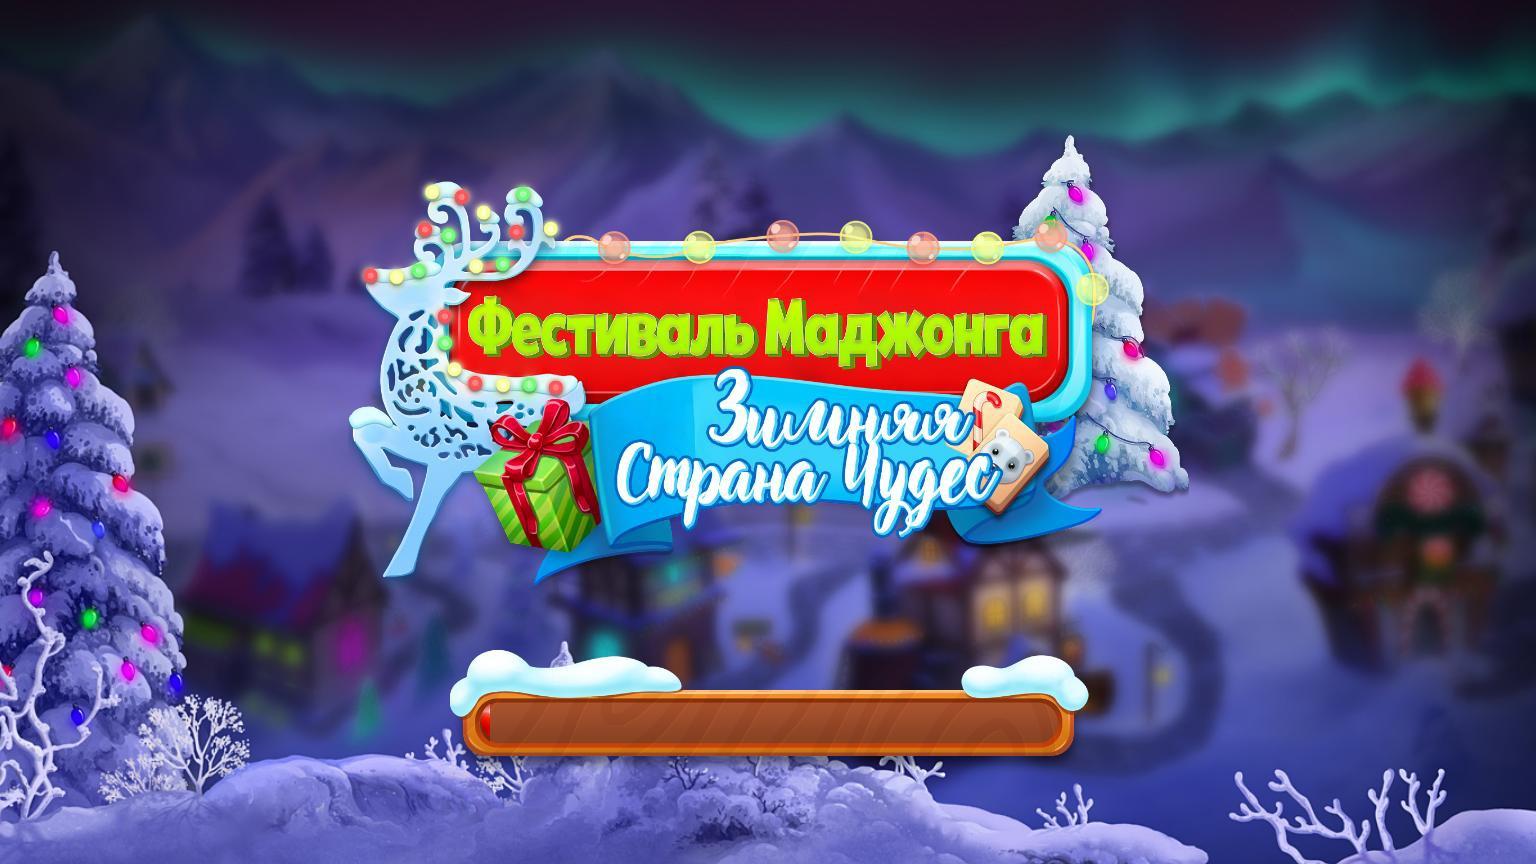 Фестиваль Маджонга: Зимняя страна чудес | Mahjong Fest: Winter Wonderland (Rus)